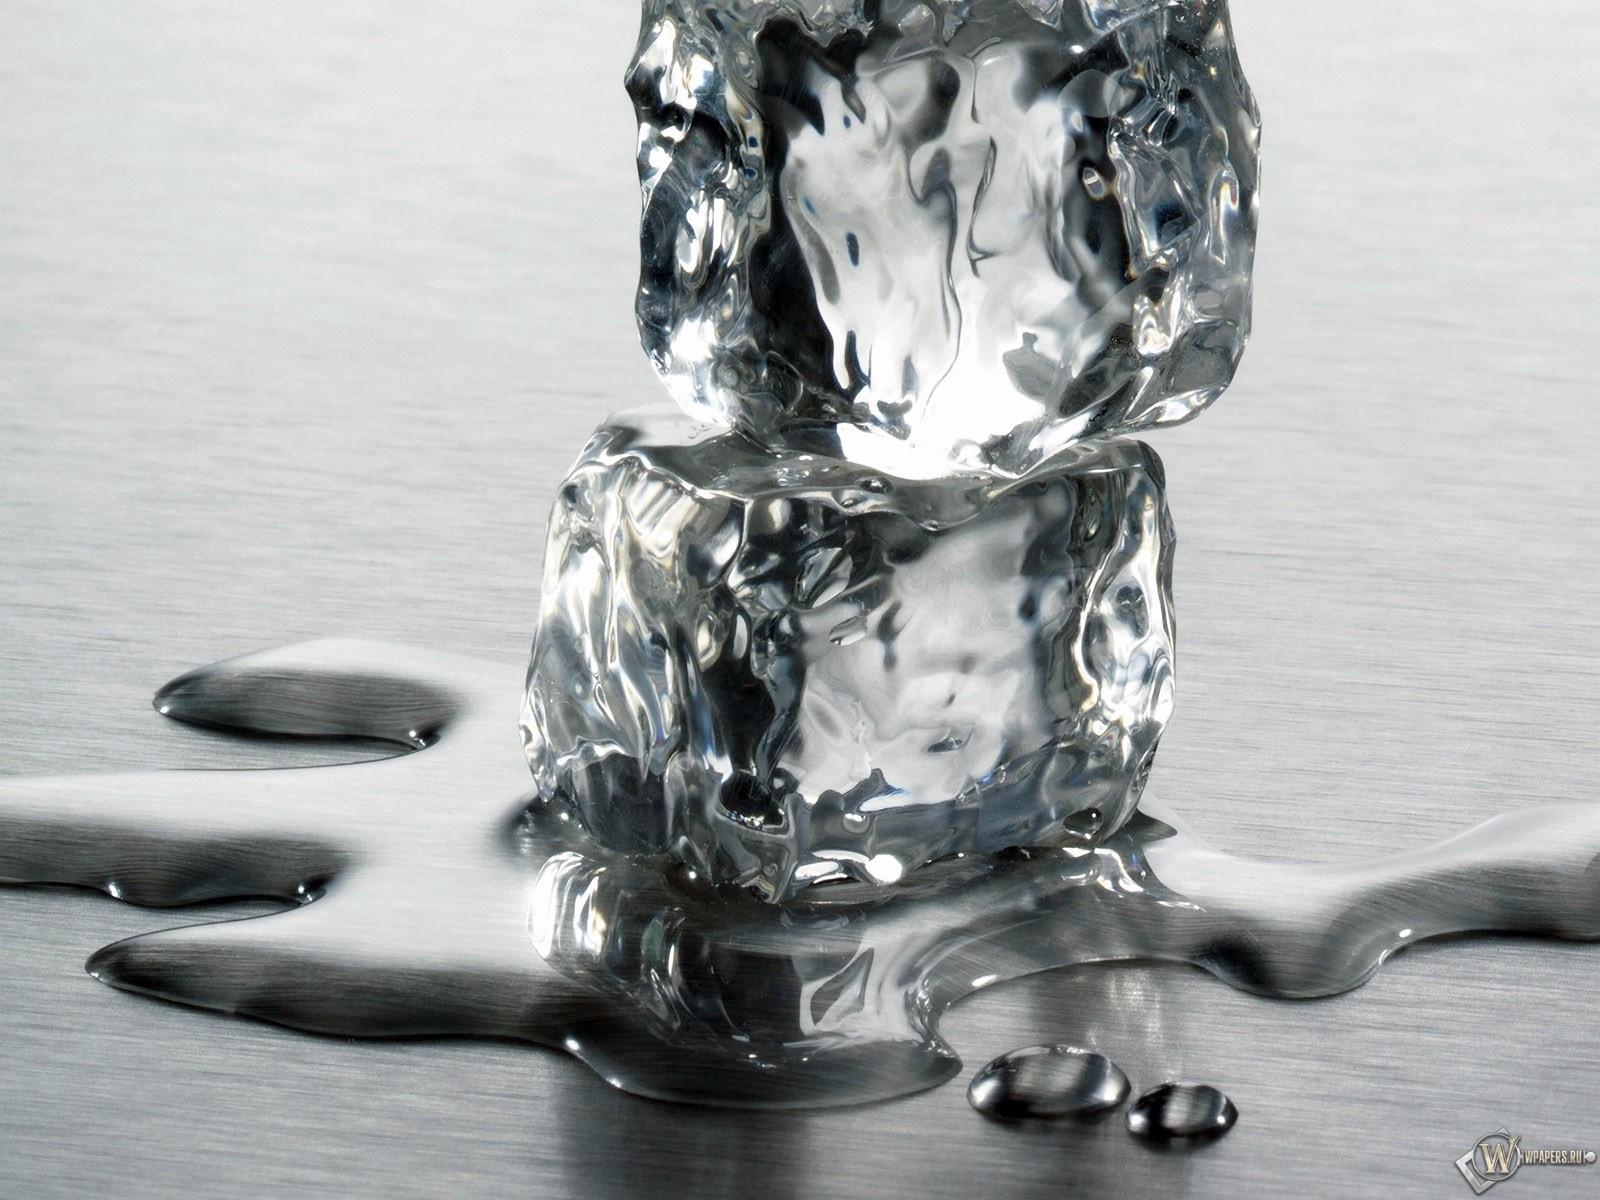 Два ледянных кубика 1600x1200